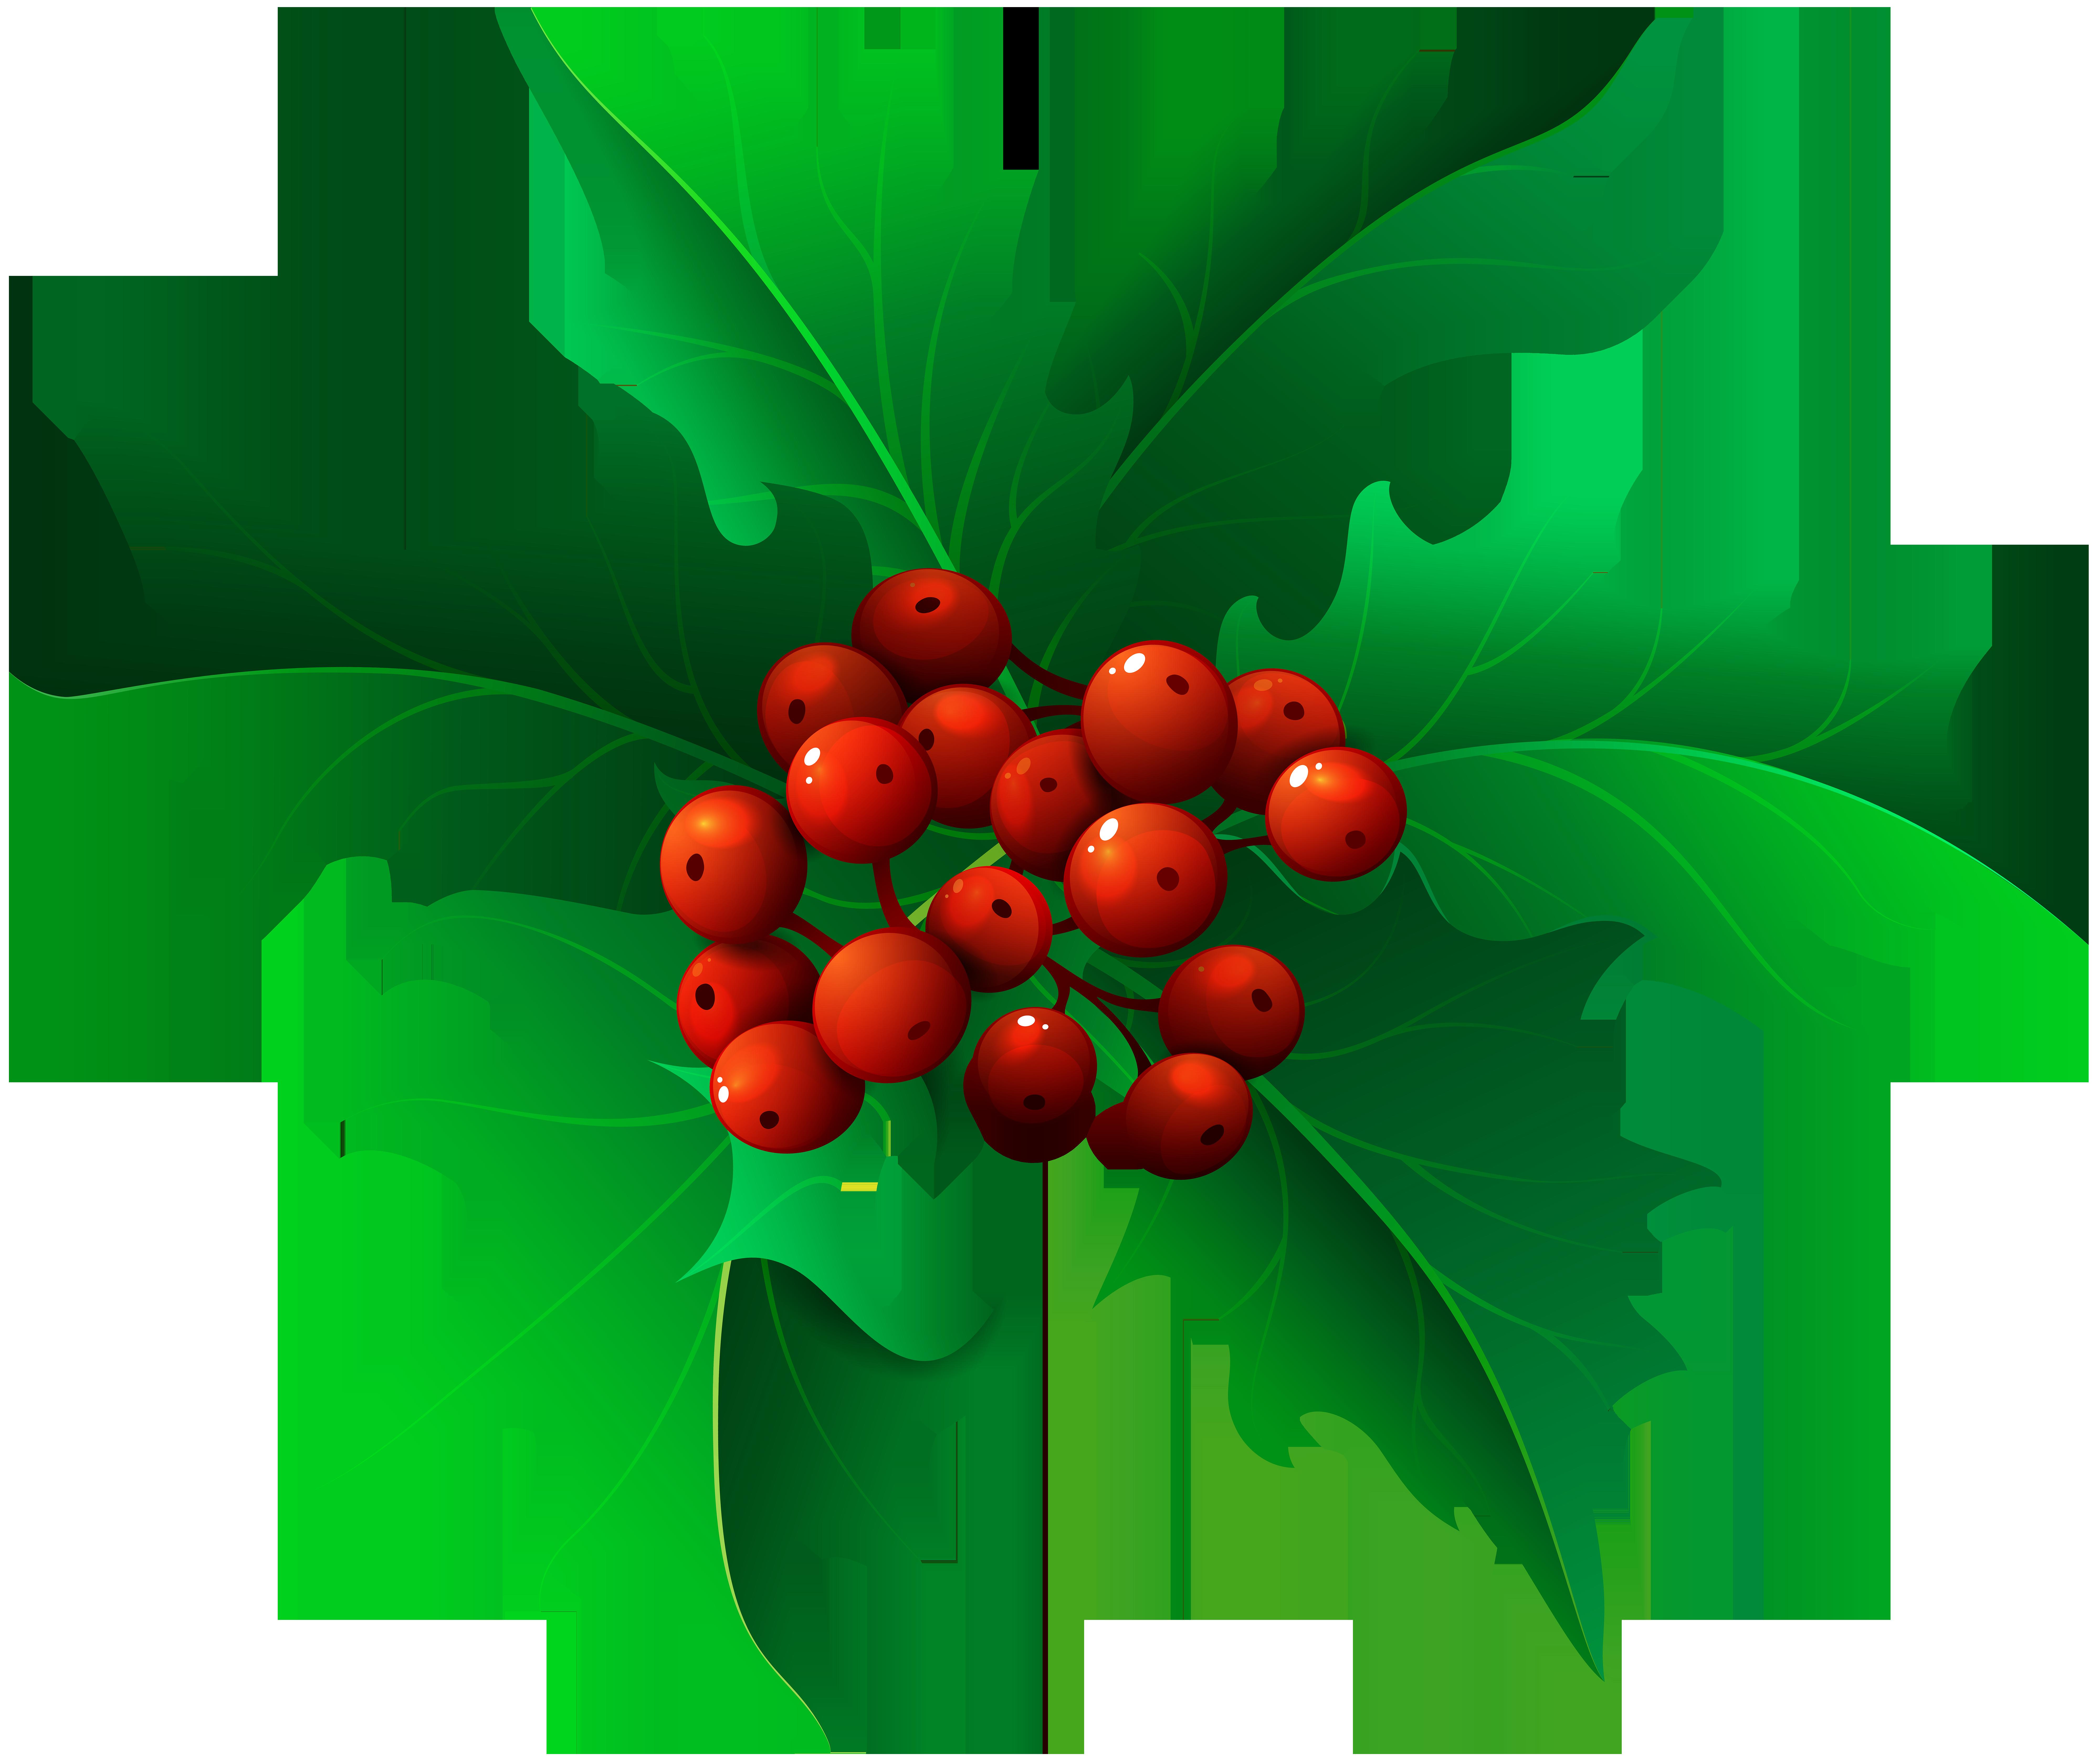 clip art library Mistletoe clipart holly sprig. Christmas transparent png clip.